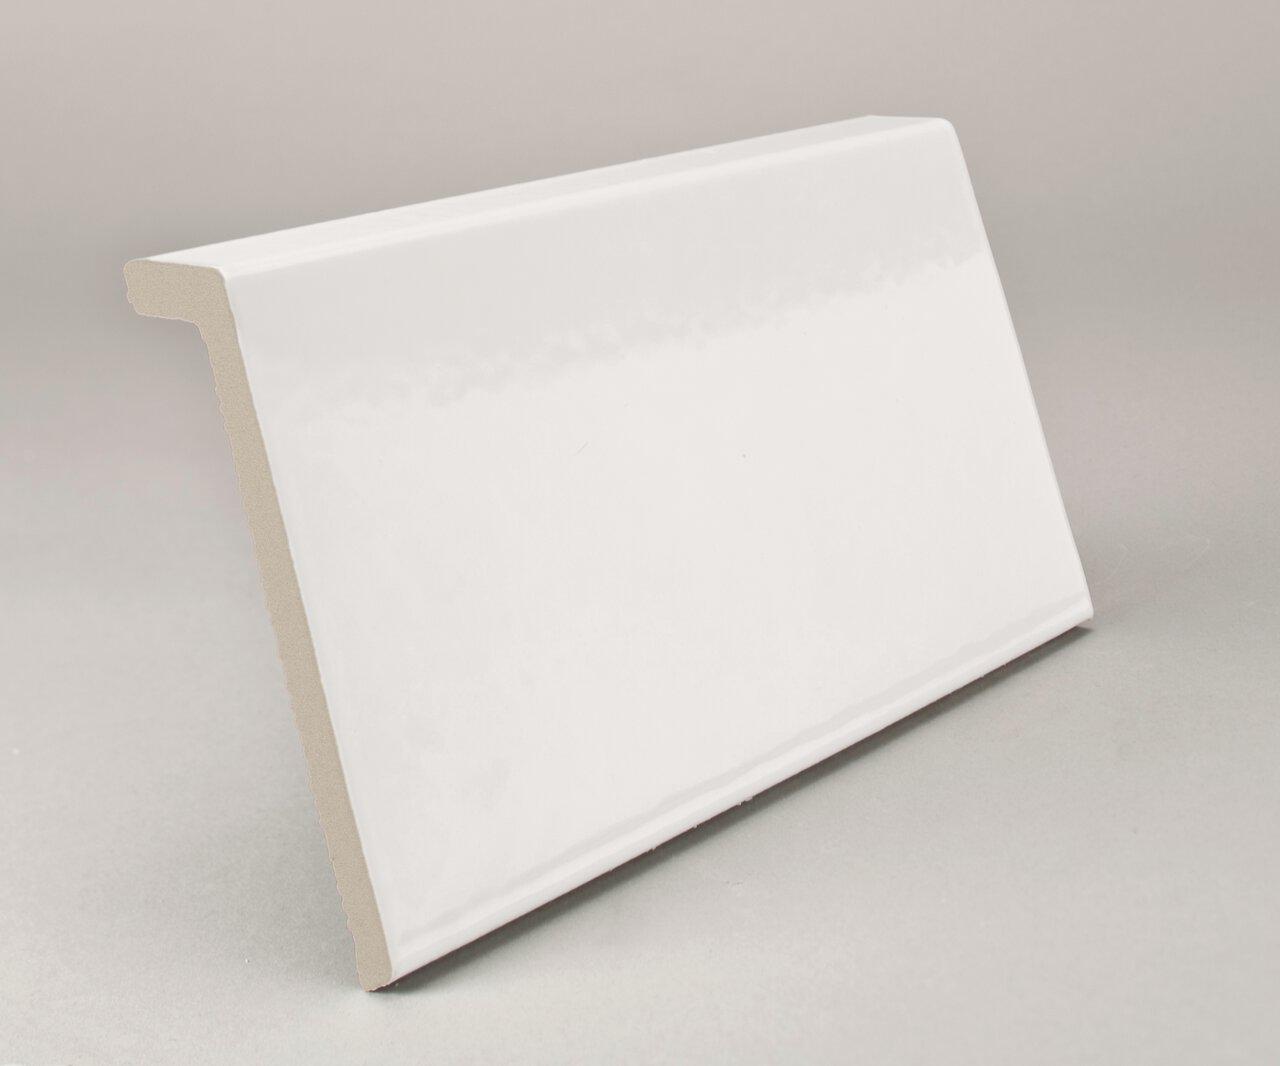 Наклонная ступенчатая плита 244x125/25x8 мм